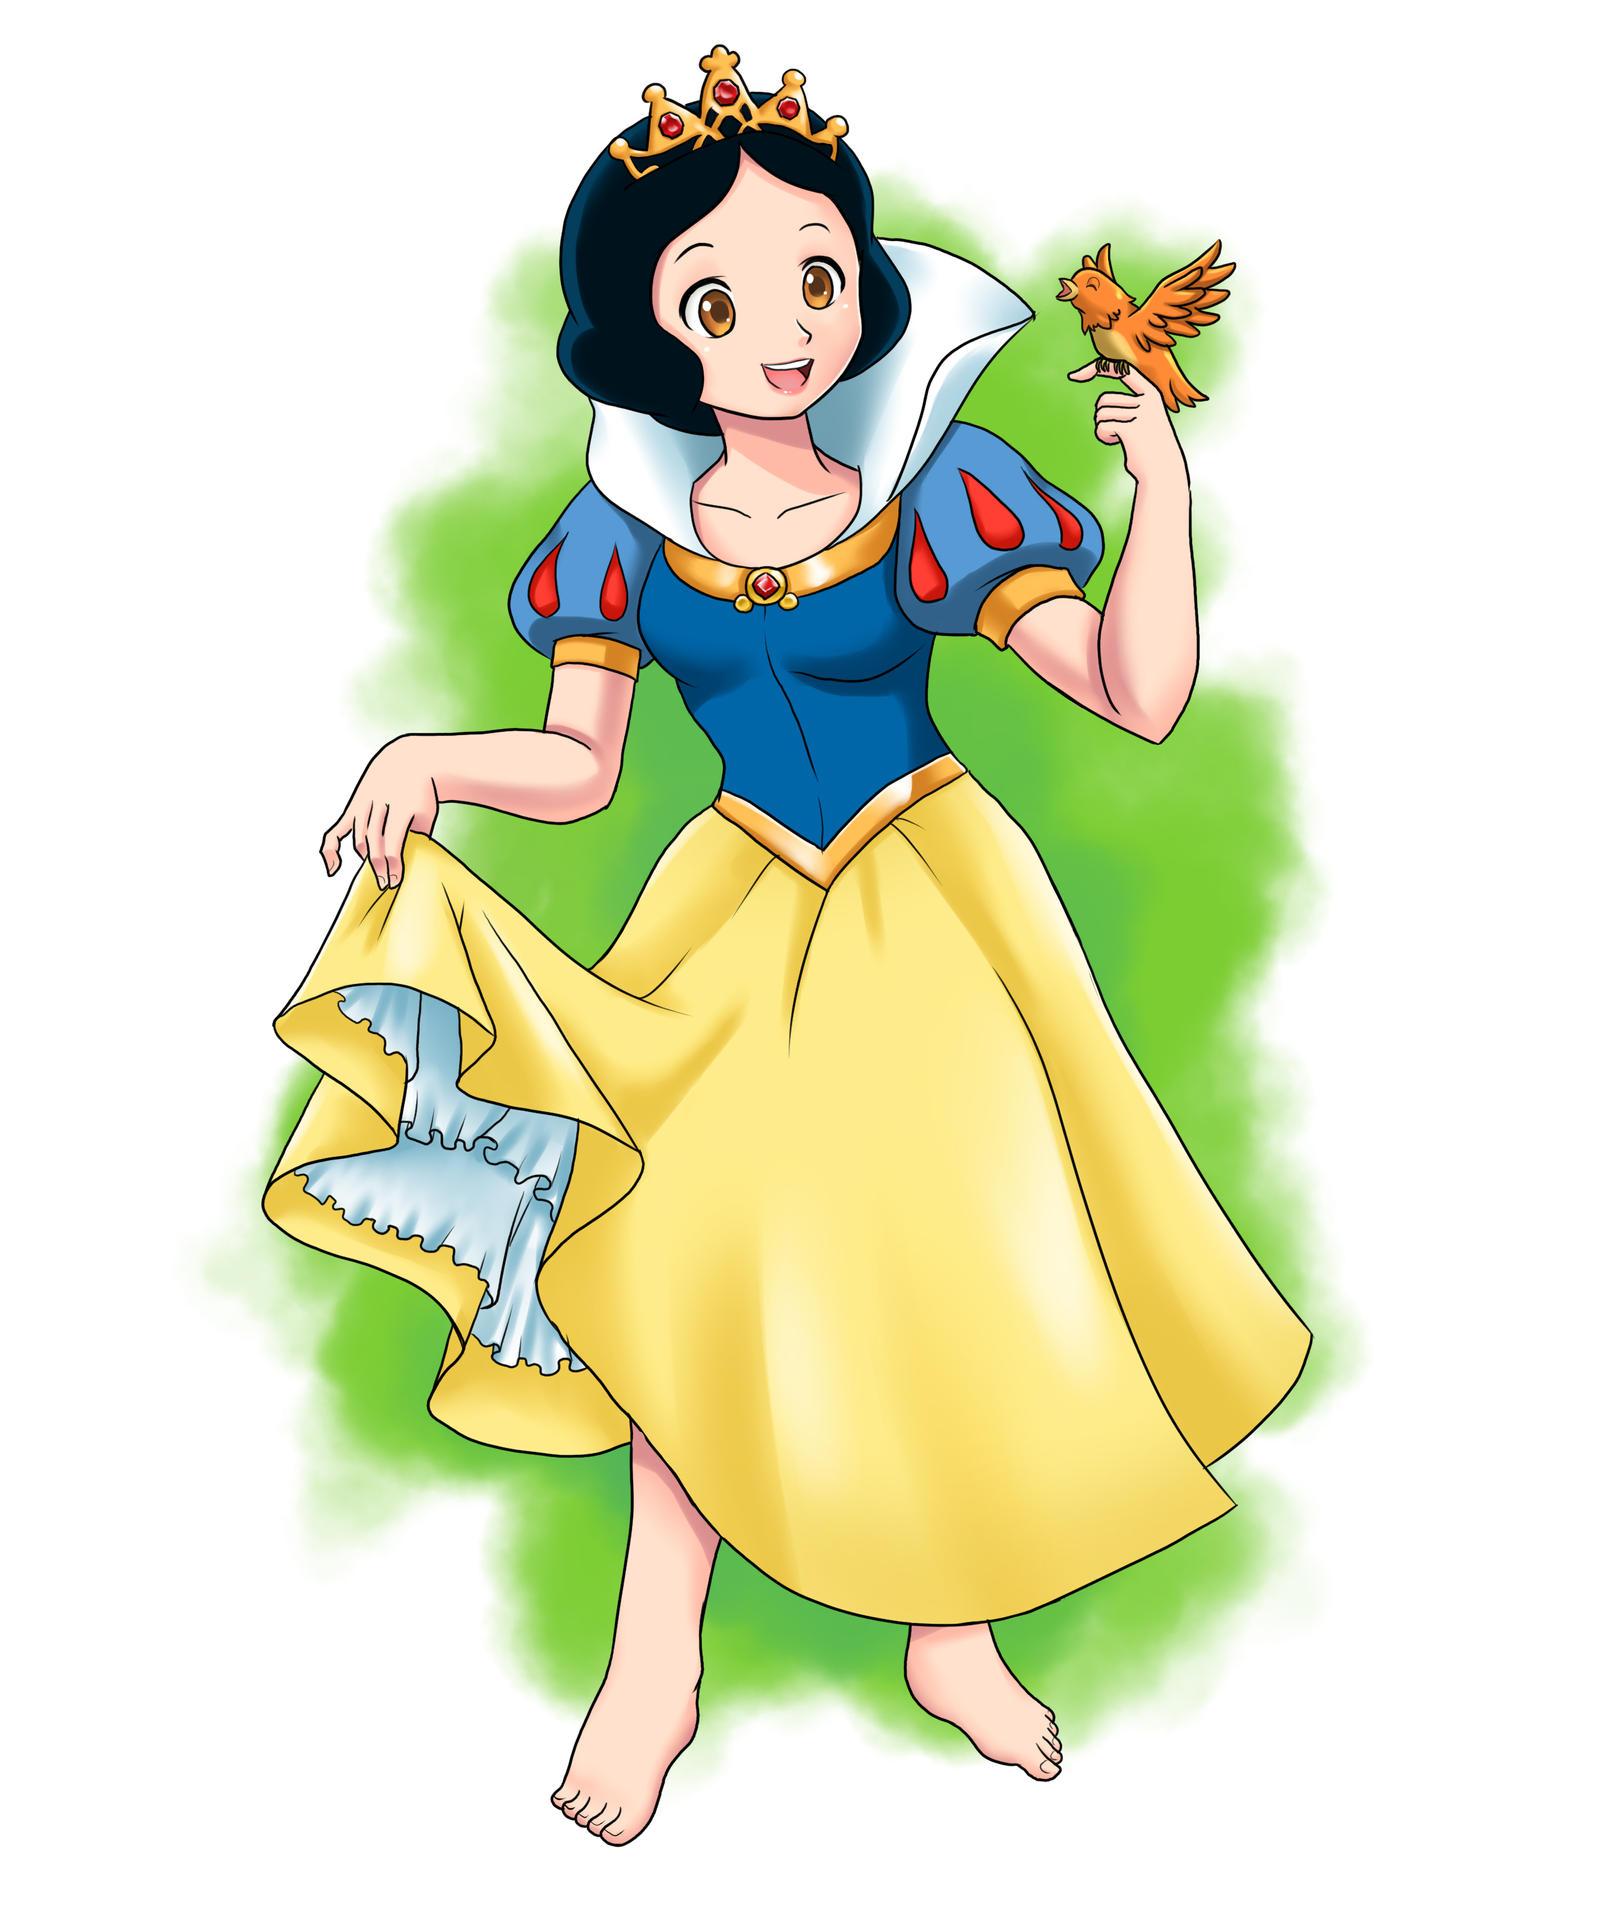 Snow White Snow White The Seven Dwarfs 1937 By Yet One More Idiot On Deviantart